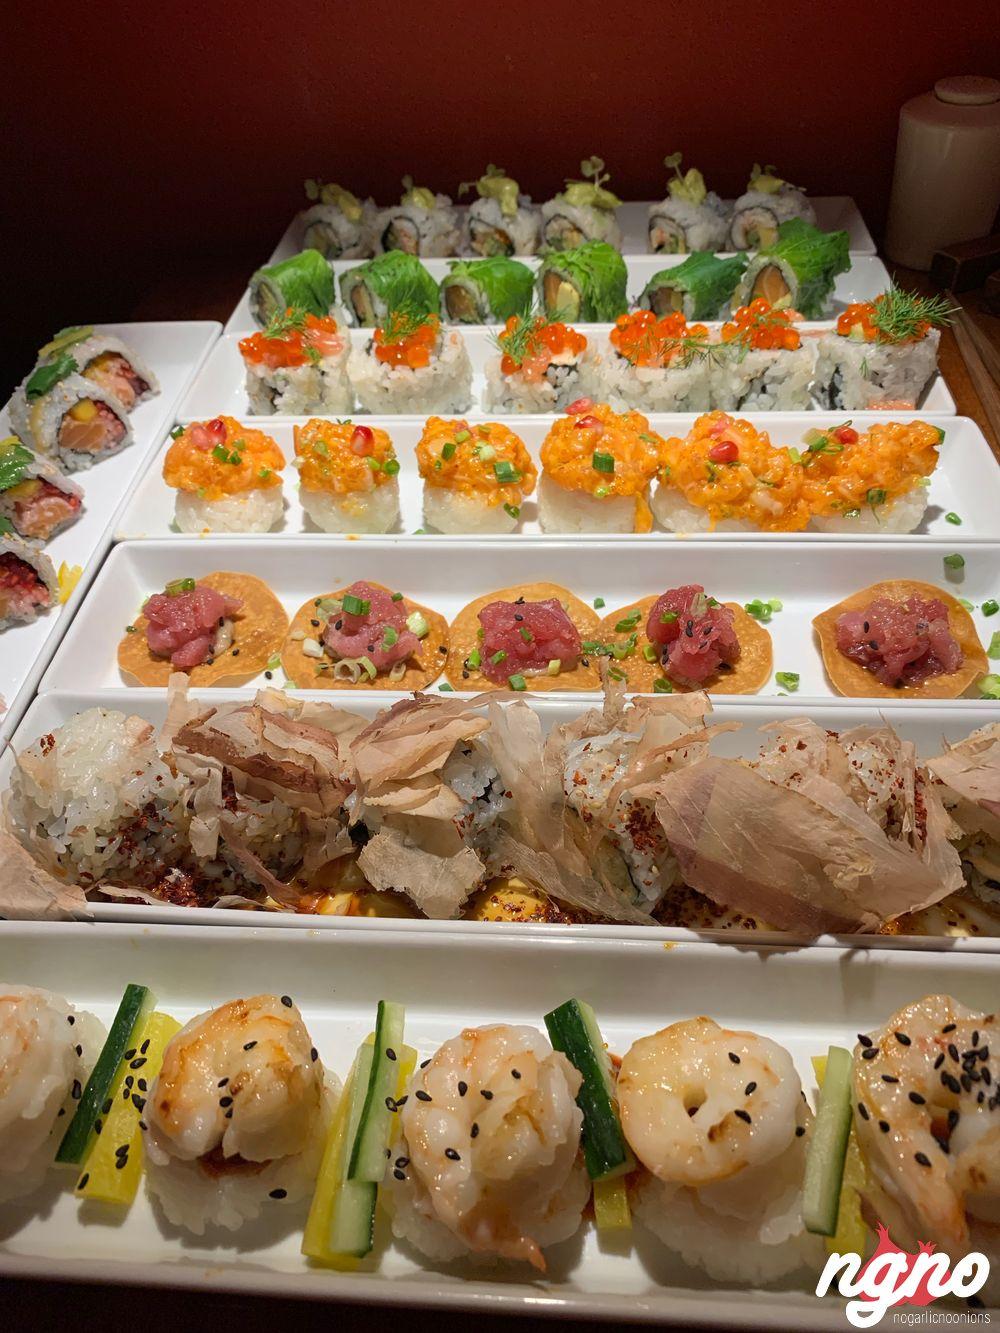 blueberry-maki-sushi-paris-nogarlicnoonions-202018-10-13-05-58-16